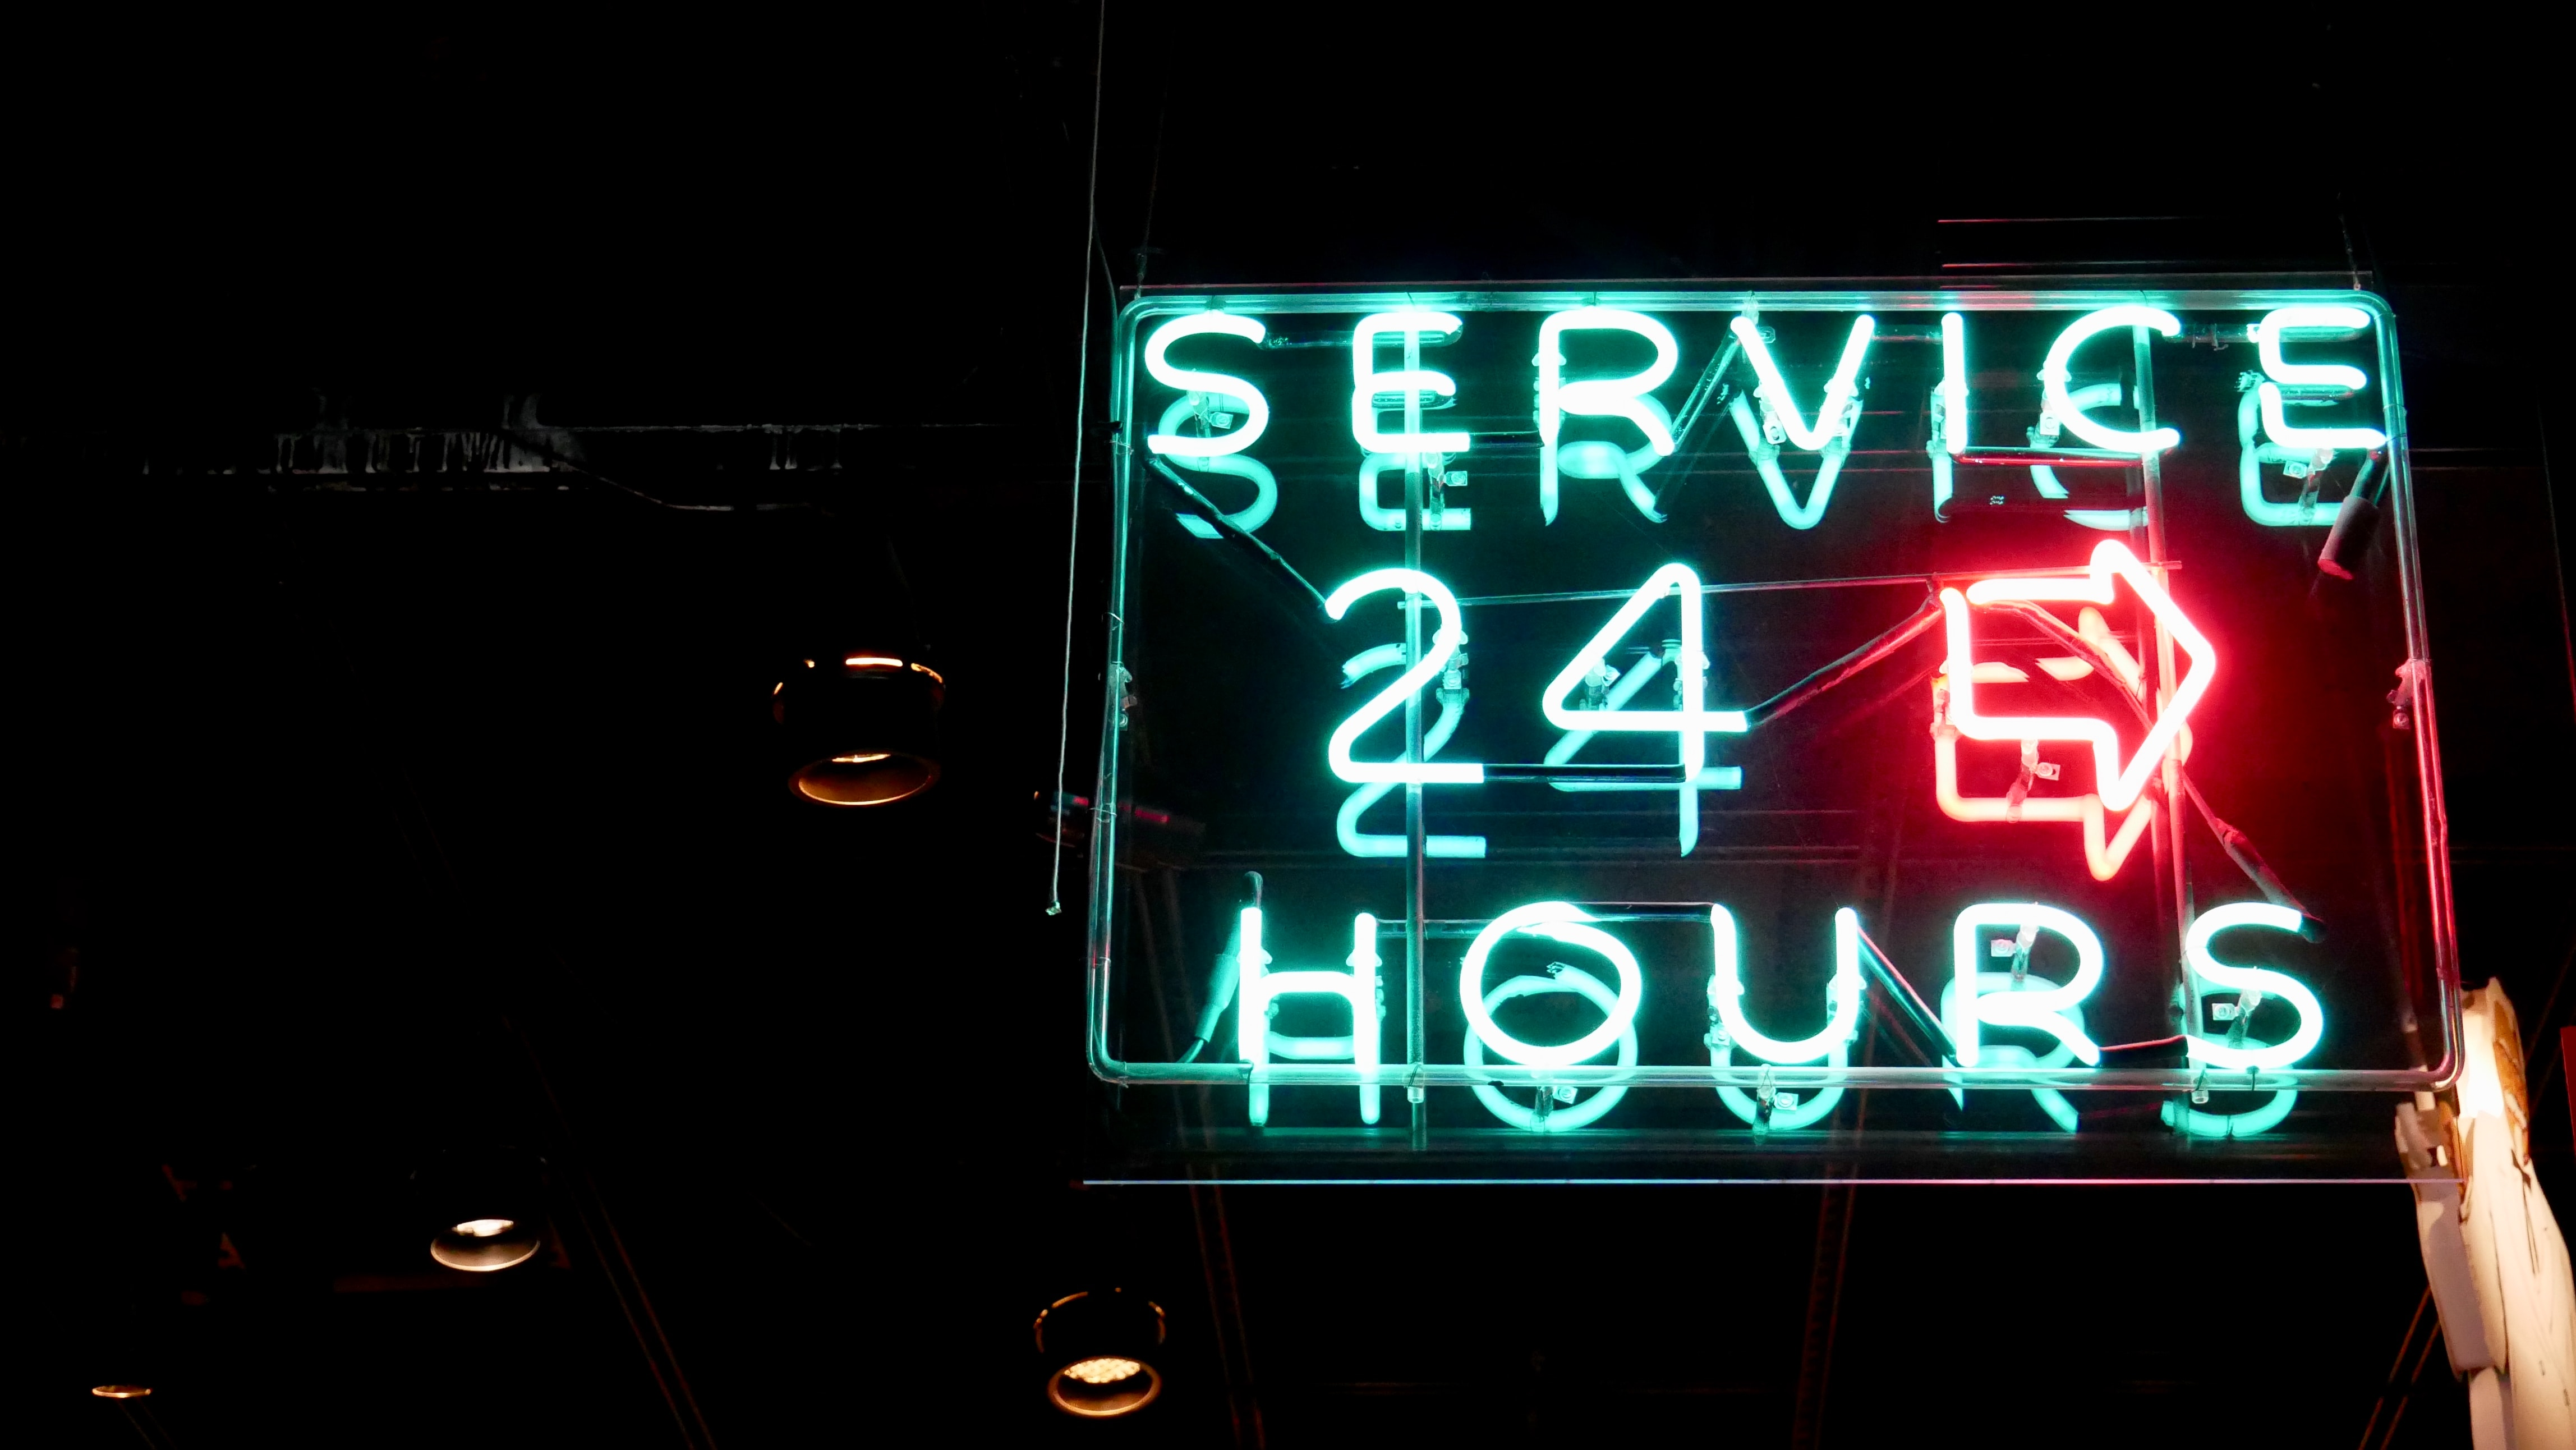 Service, 24/7